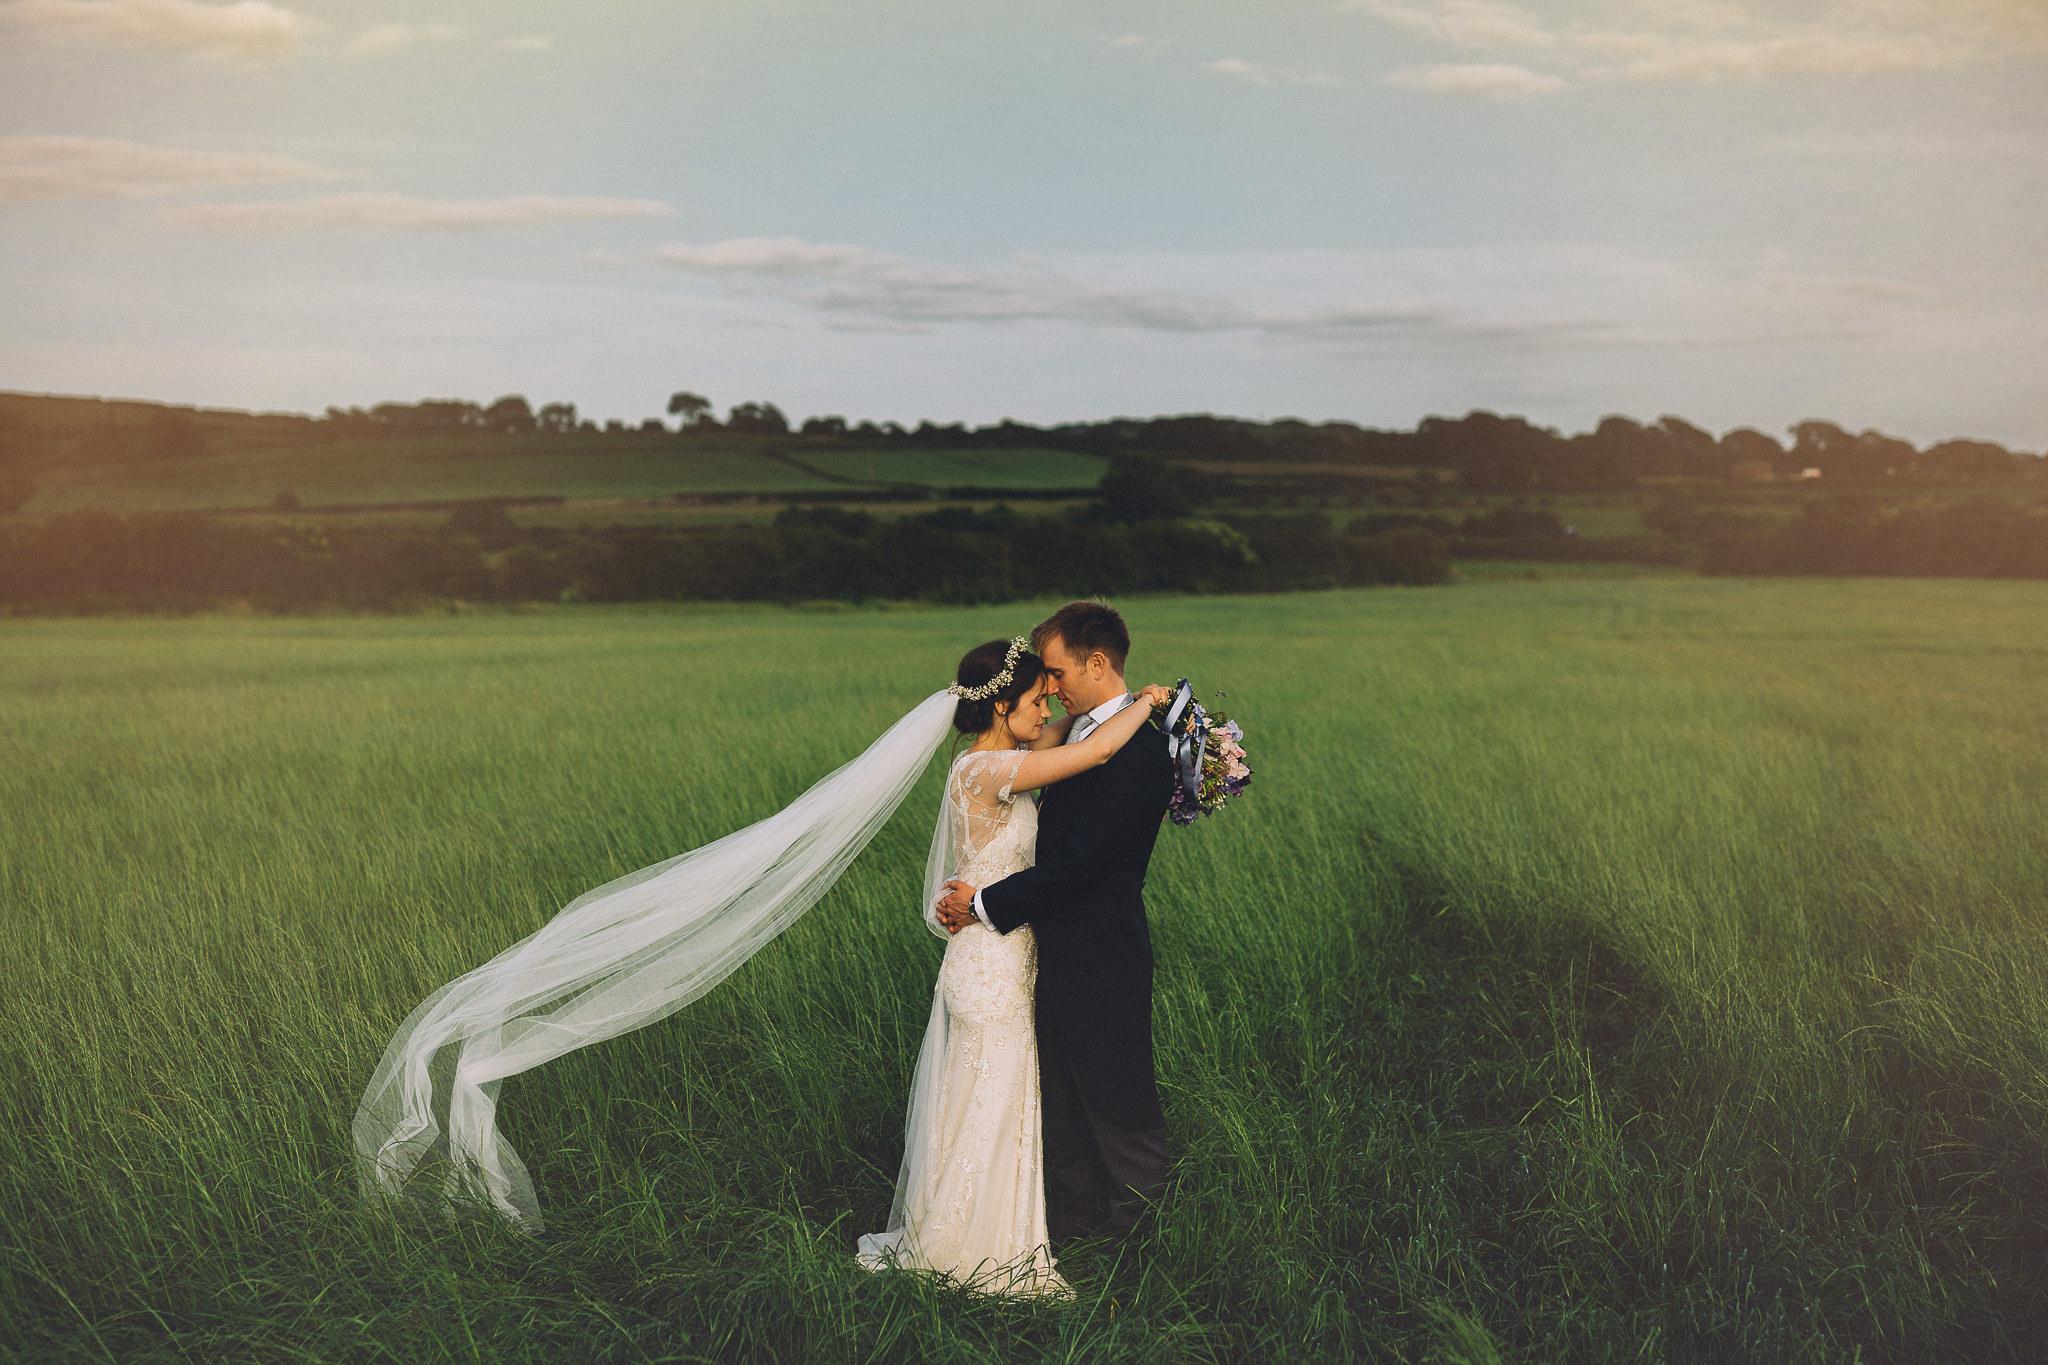 paul-marbrook-Farm-Wedding-Photographer-Lancashire-90069